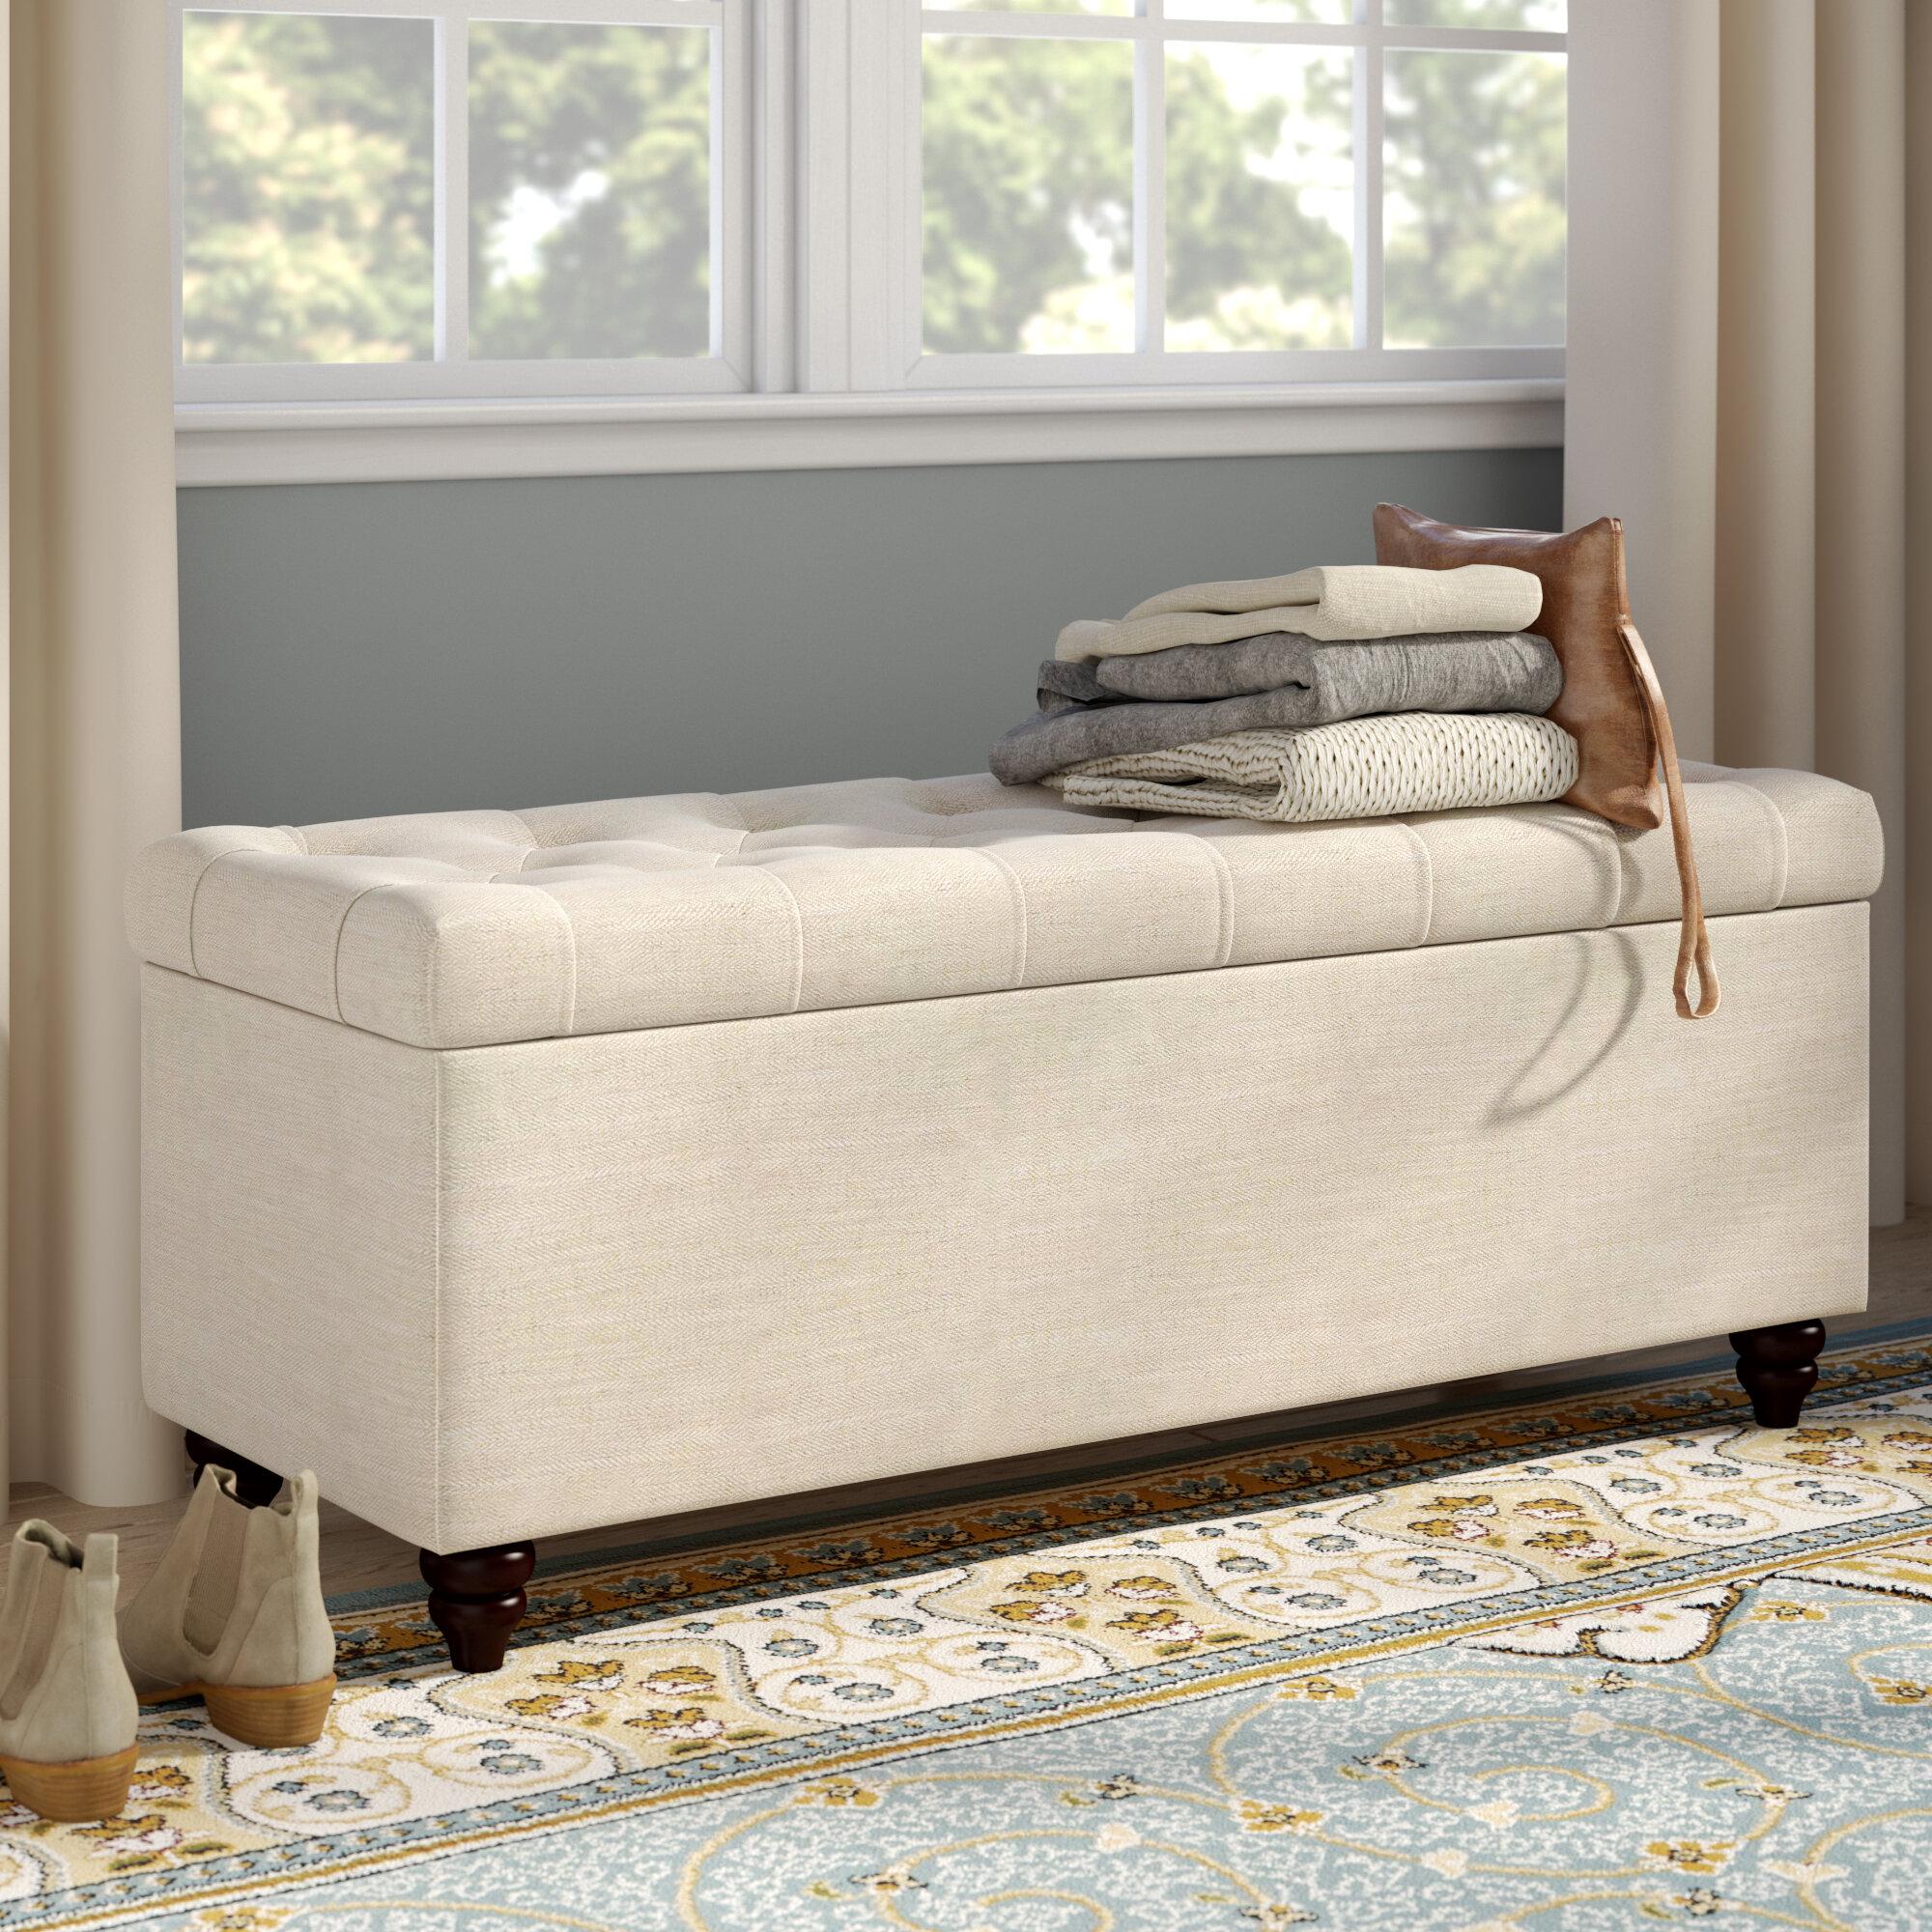 Diamond Sofa Chesterfield Upholstered Storage Bedroom Bench ...